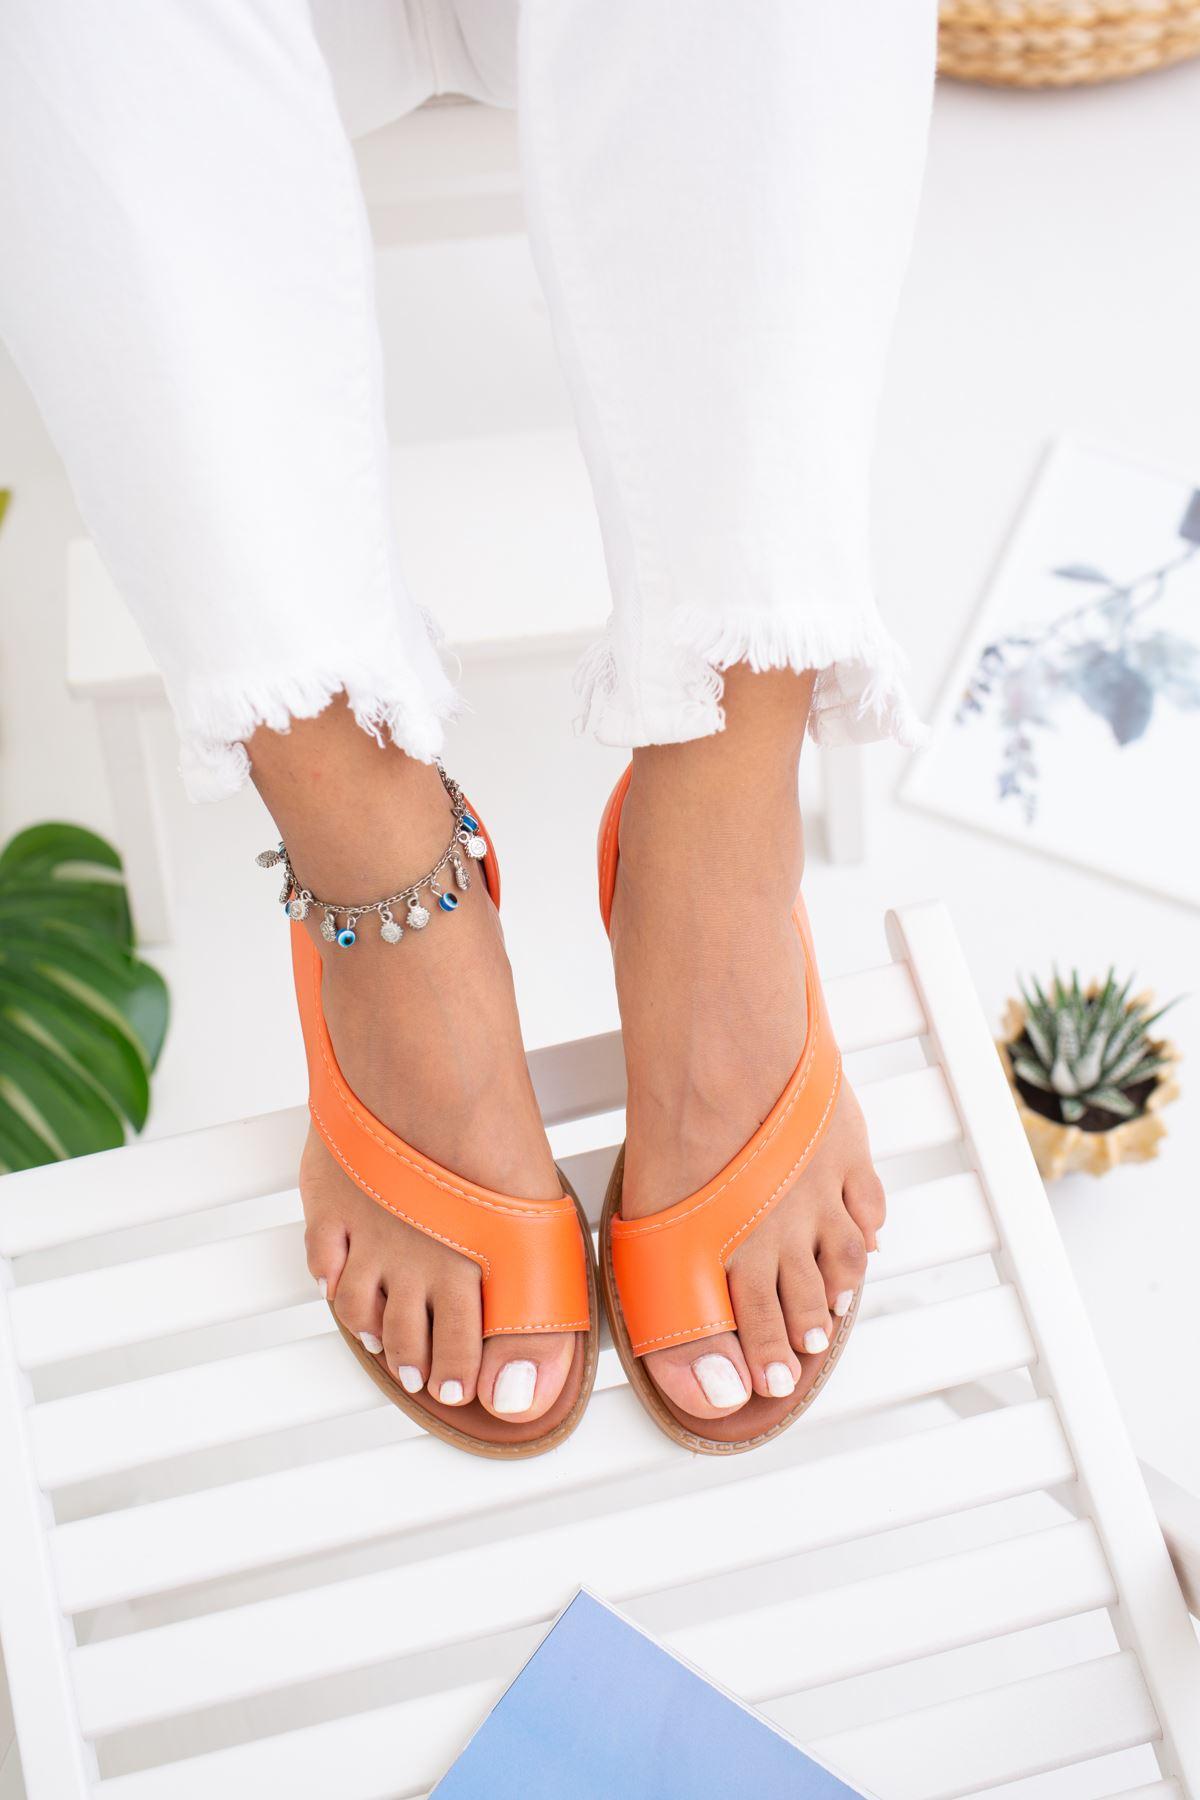 Parmak Arası Turuncu Sandalet